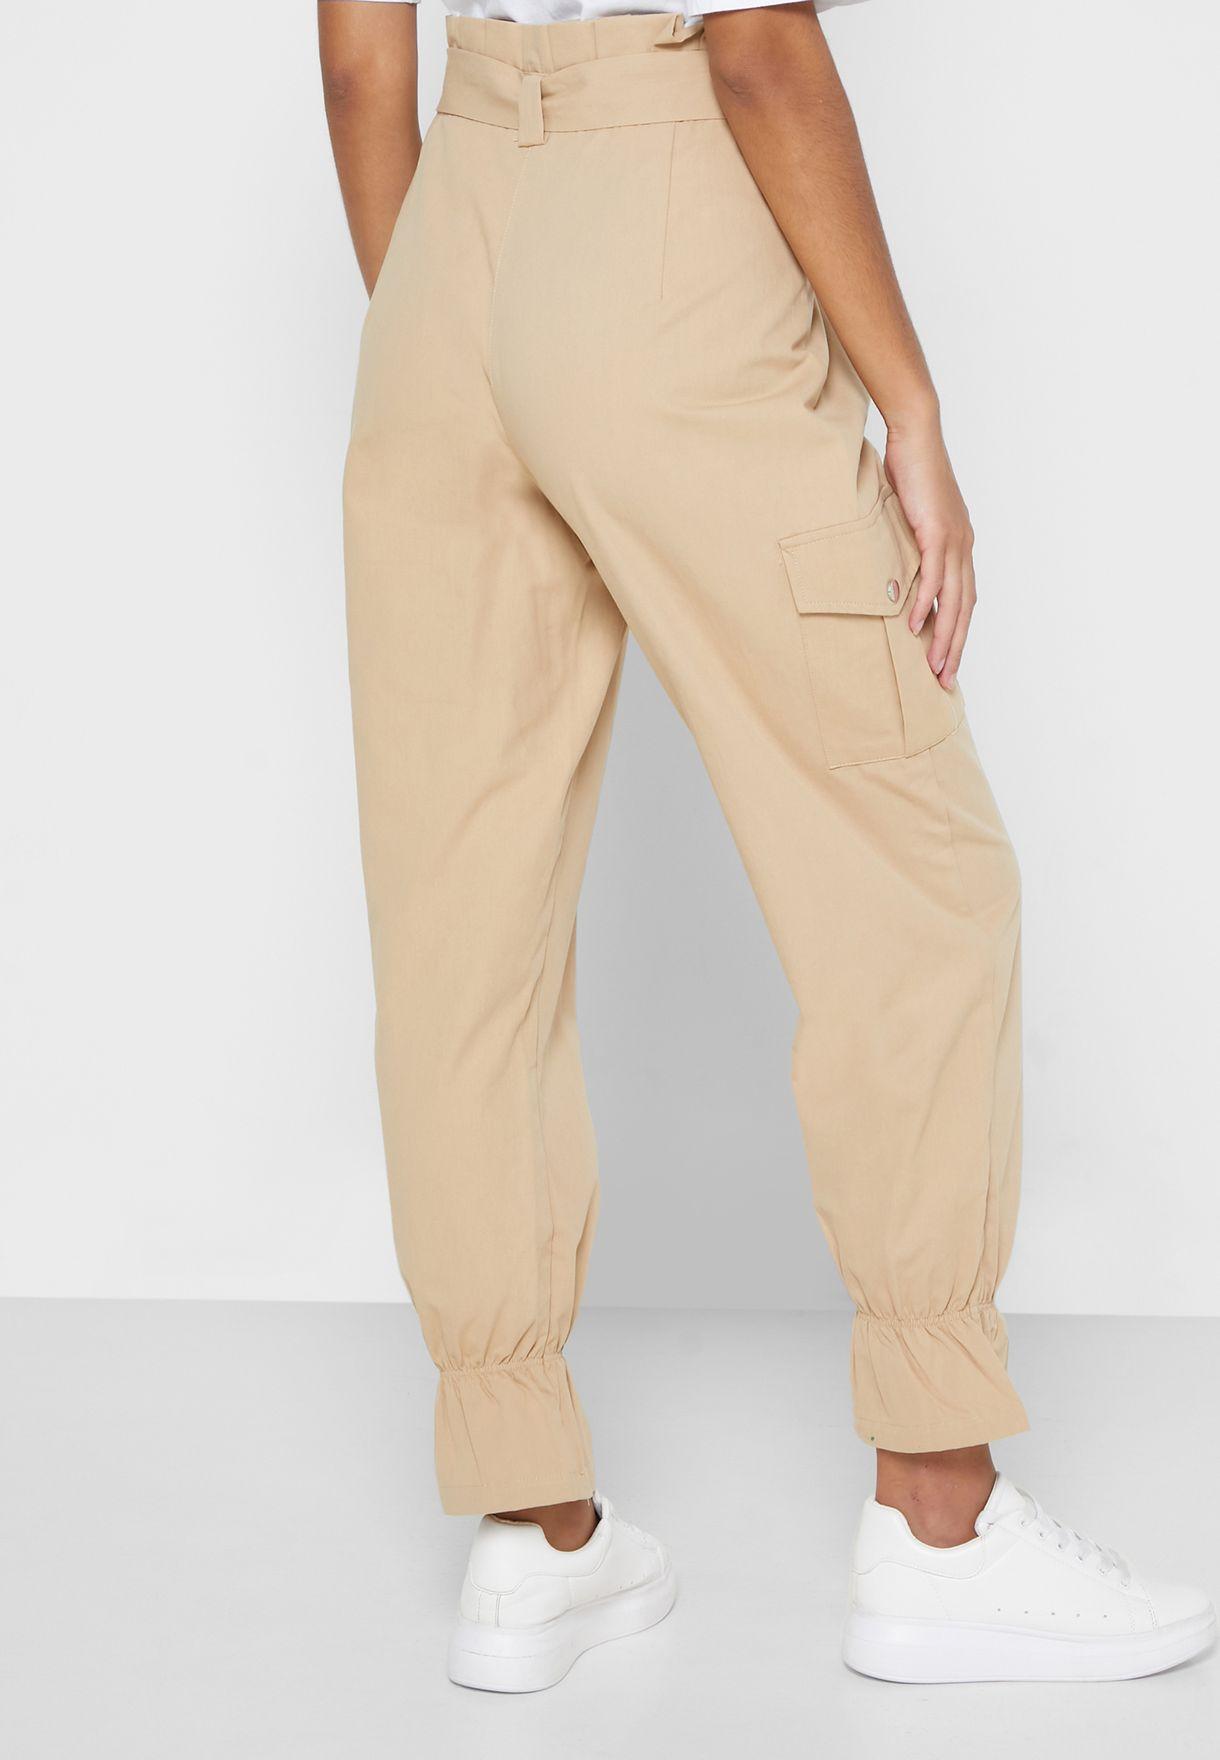 Hem Tie Detail Pants